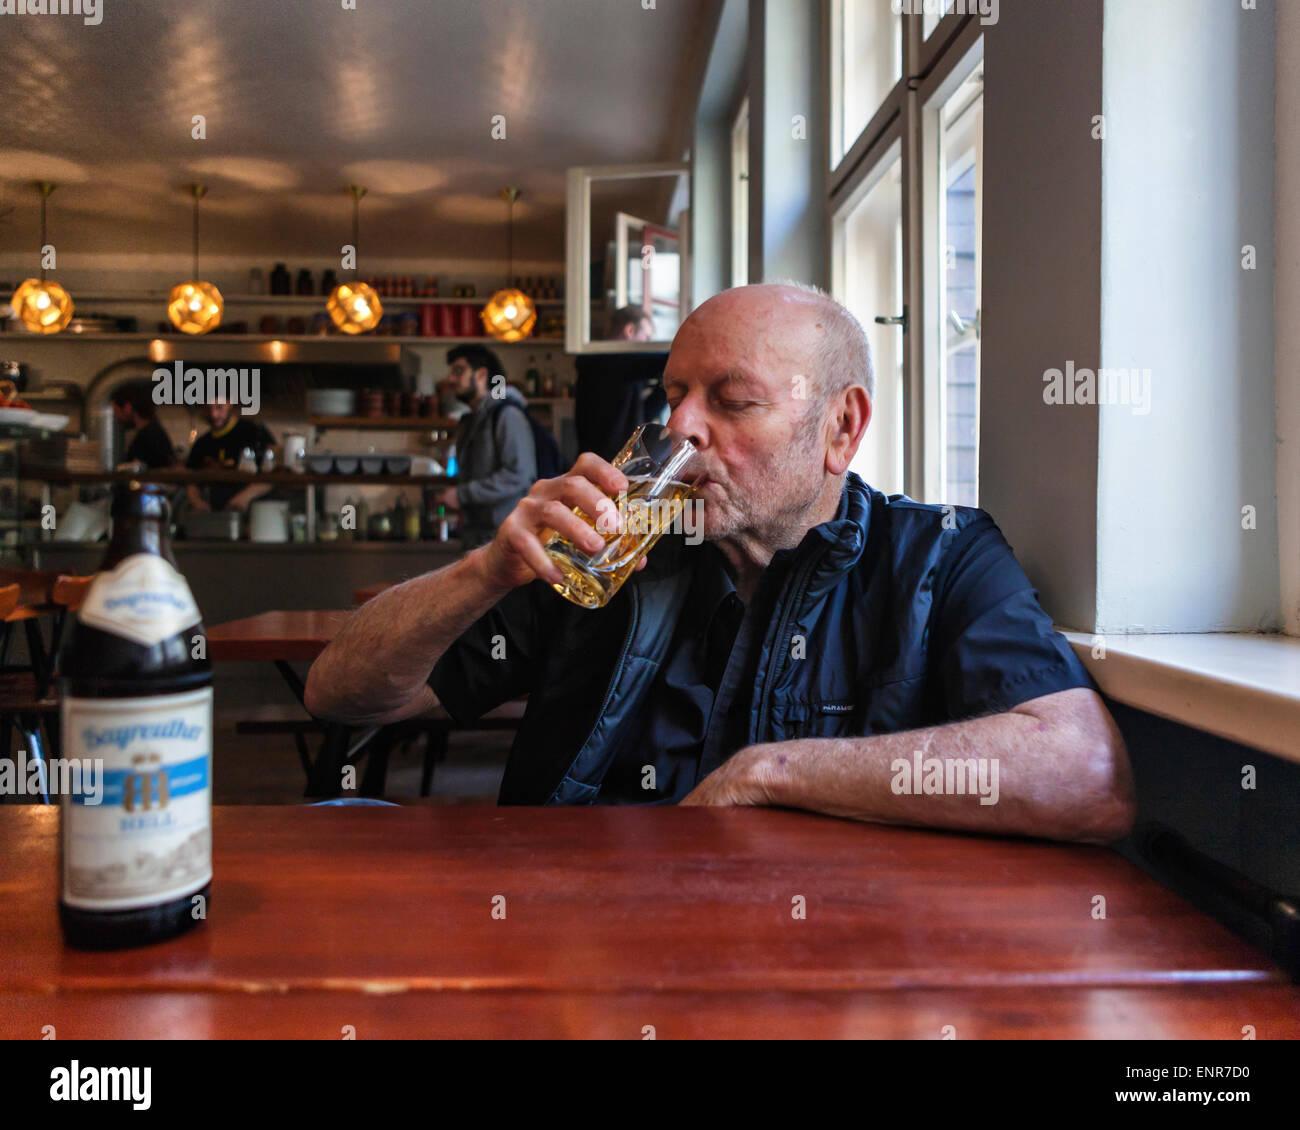 Mogg & Melzer diner interior and senior man drinking German Beer, Auguststrasse, Berlin - Stock Image